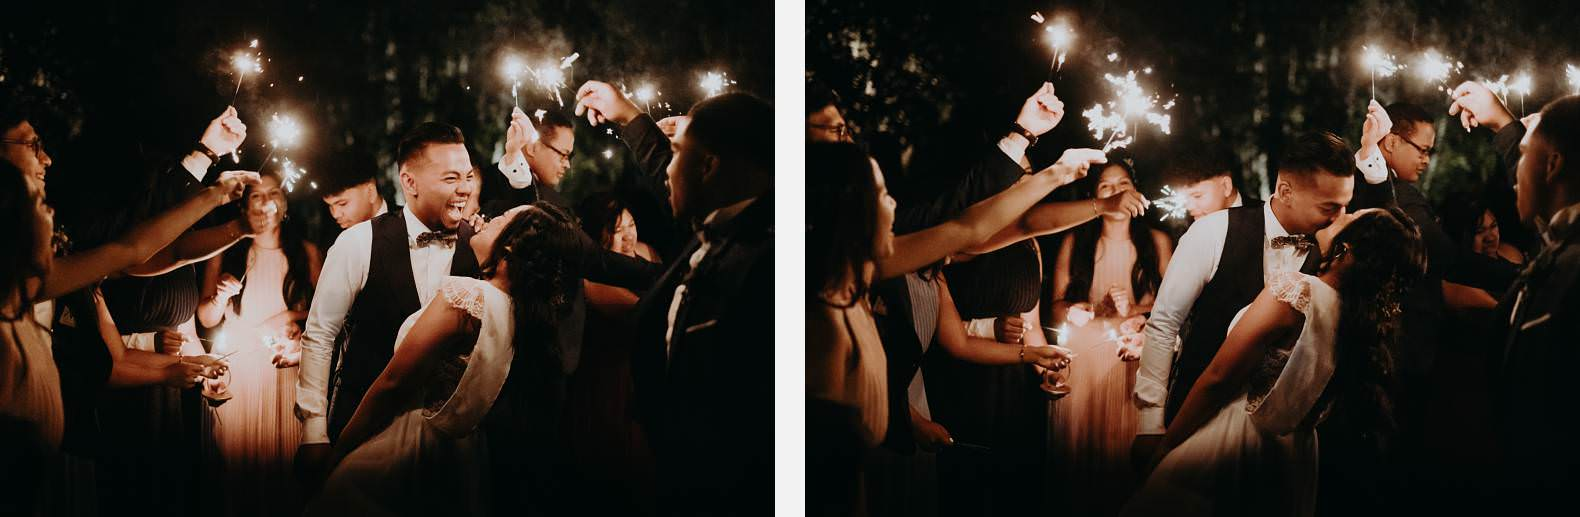 mariage manoir de corny photographe bel esprit 0074 1